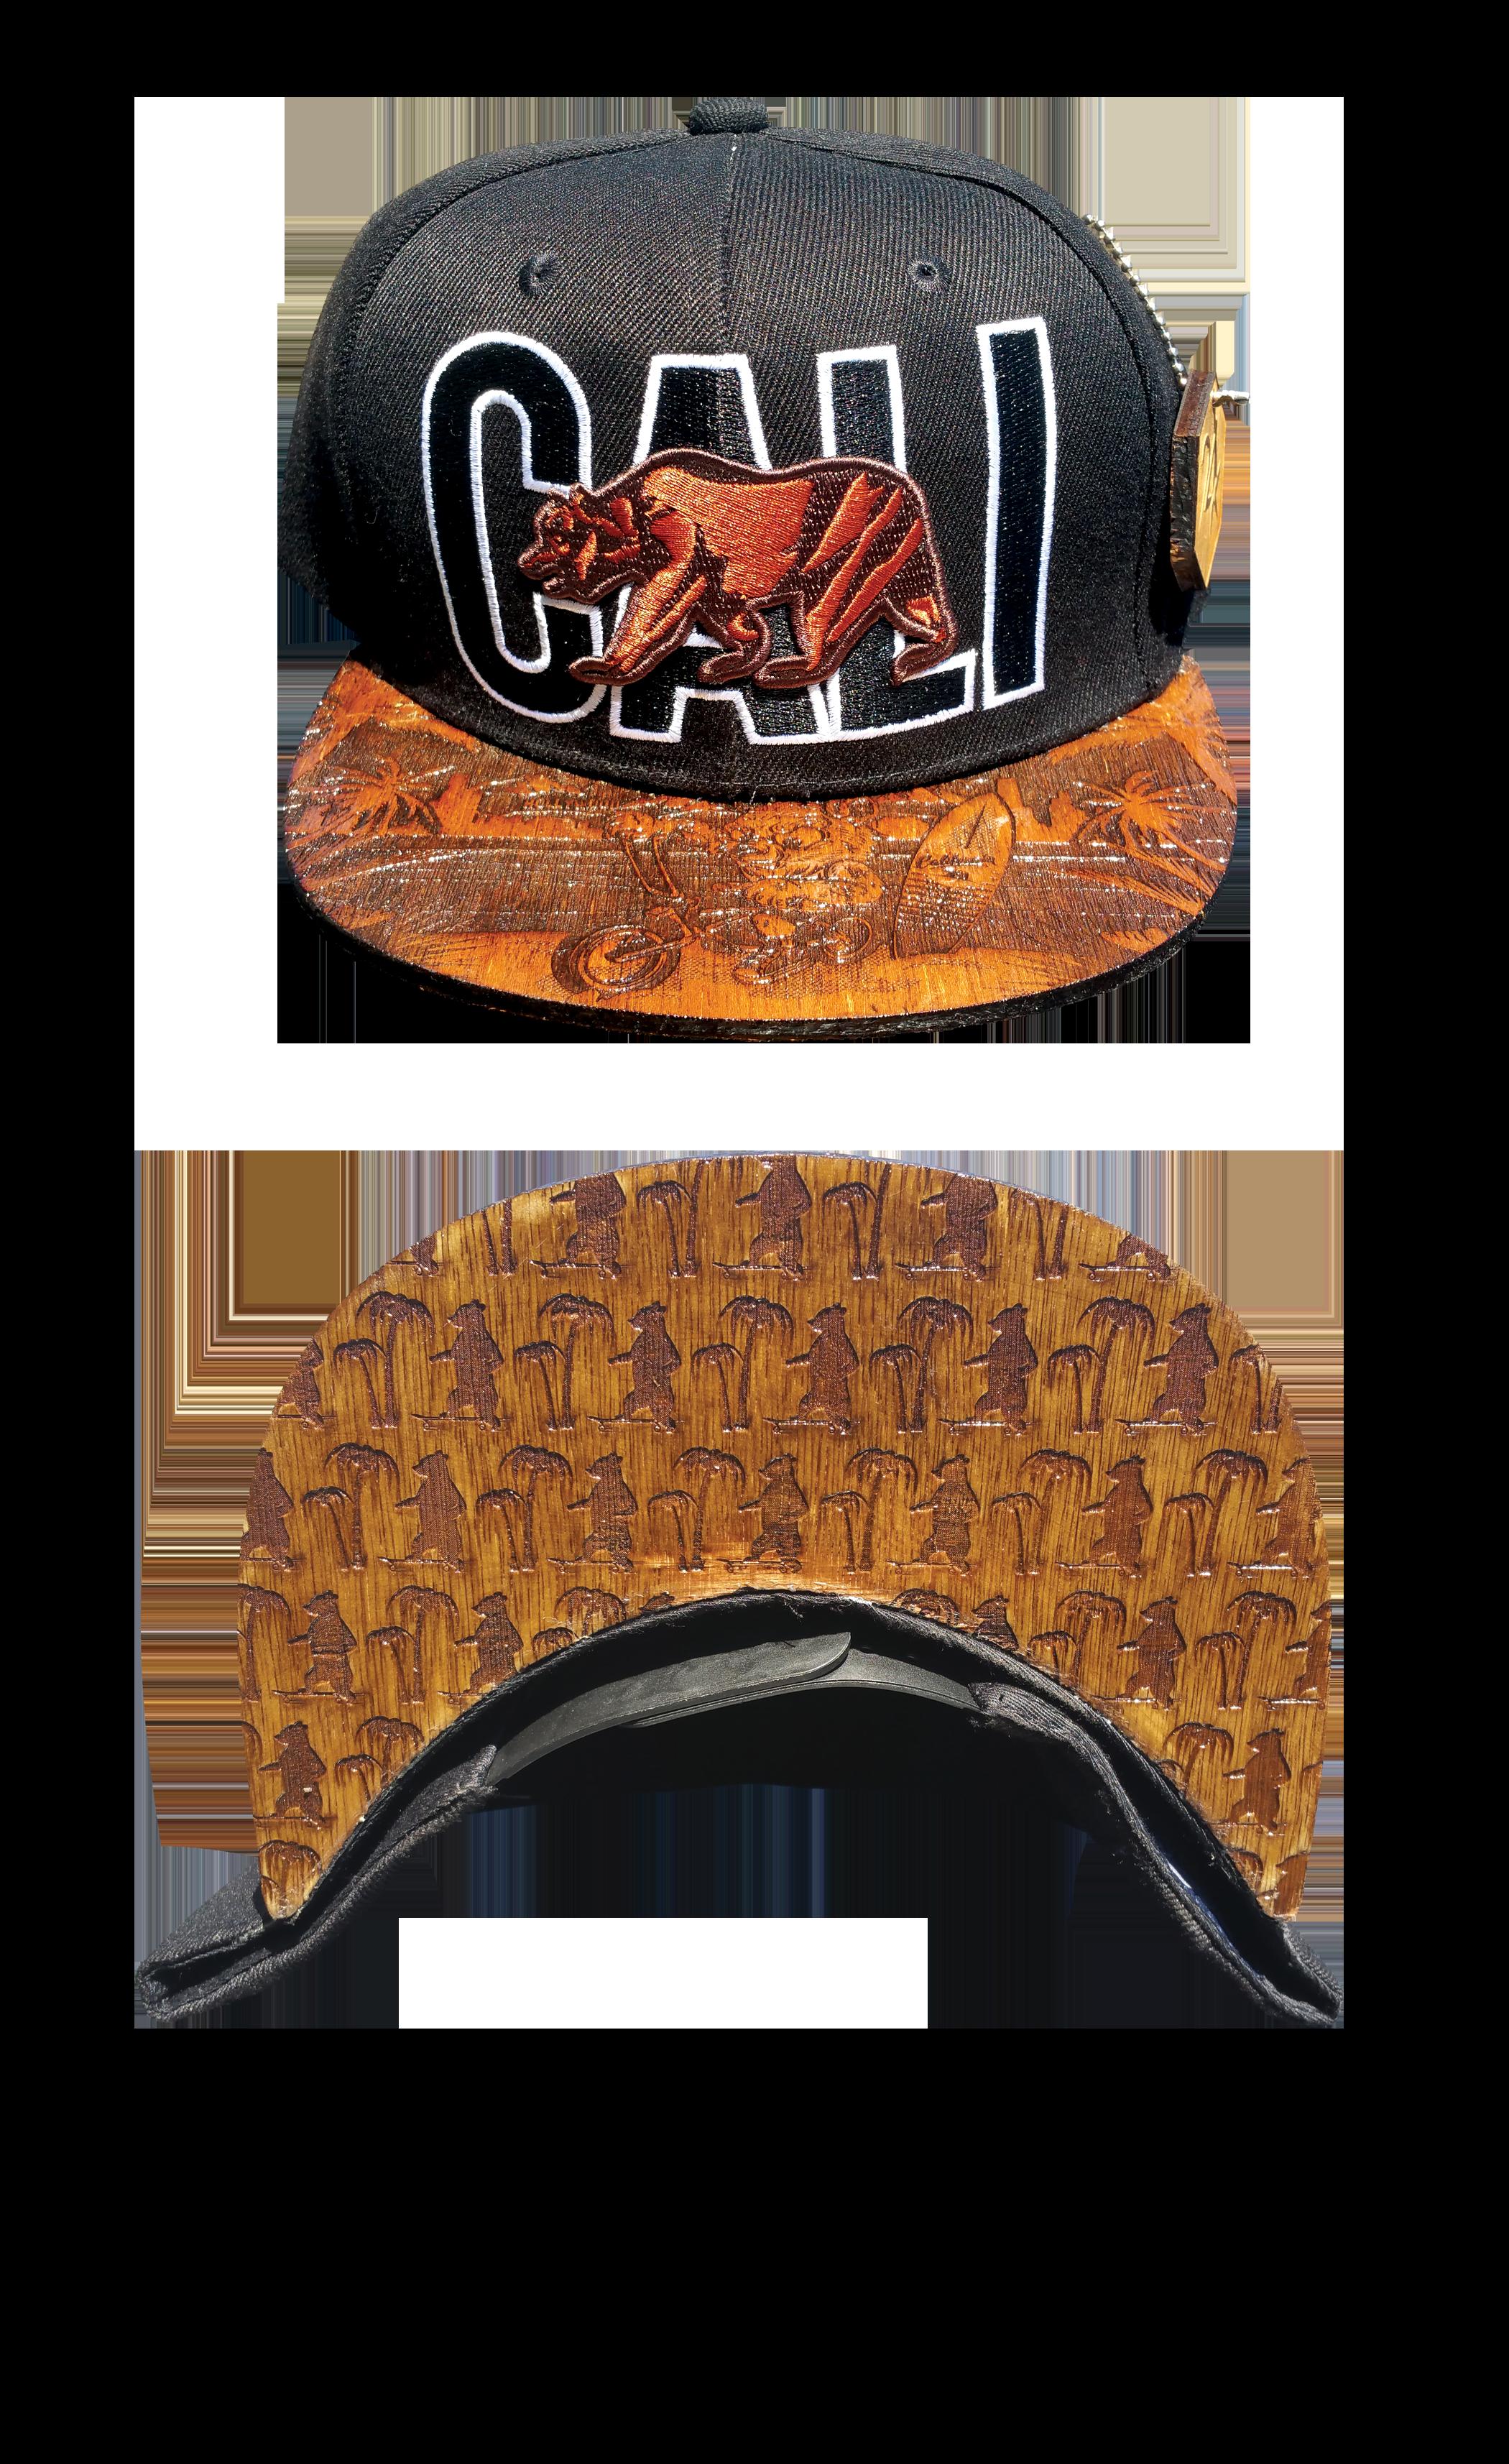 24K Wood Etched Brims Hats San Diego, CA